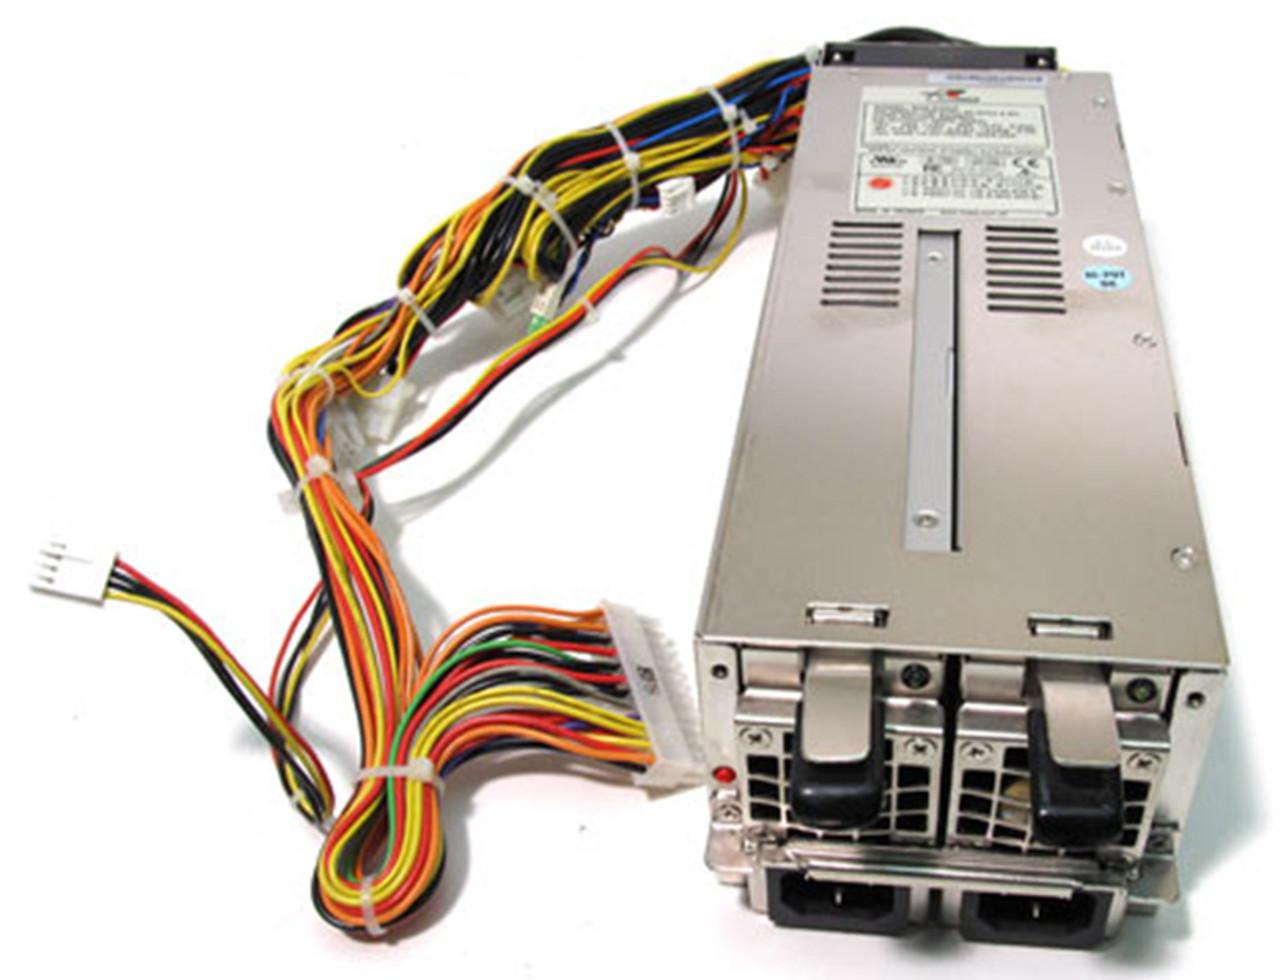 GIN 6350P EMACS 350 Watts Hot Plug Power Supply